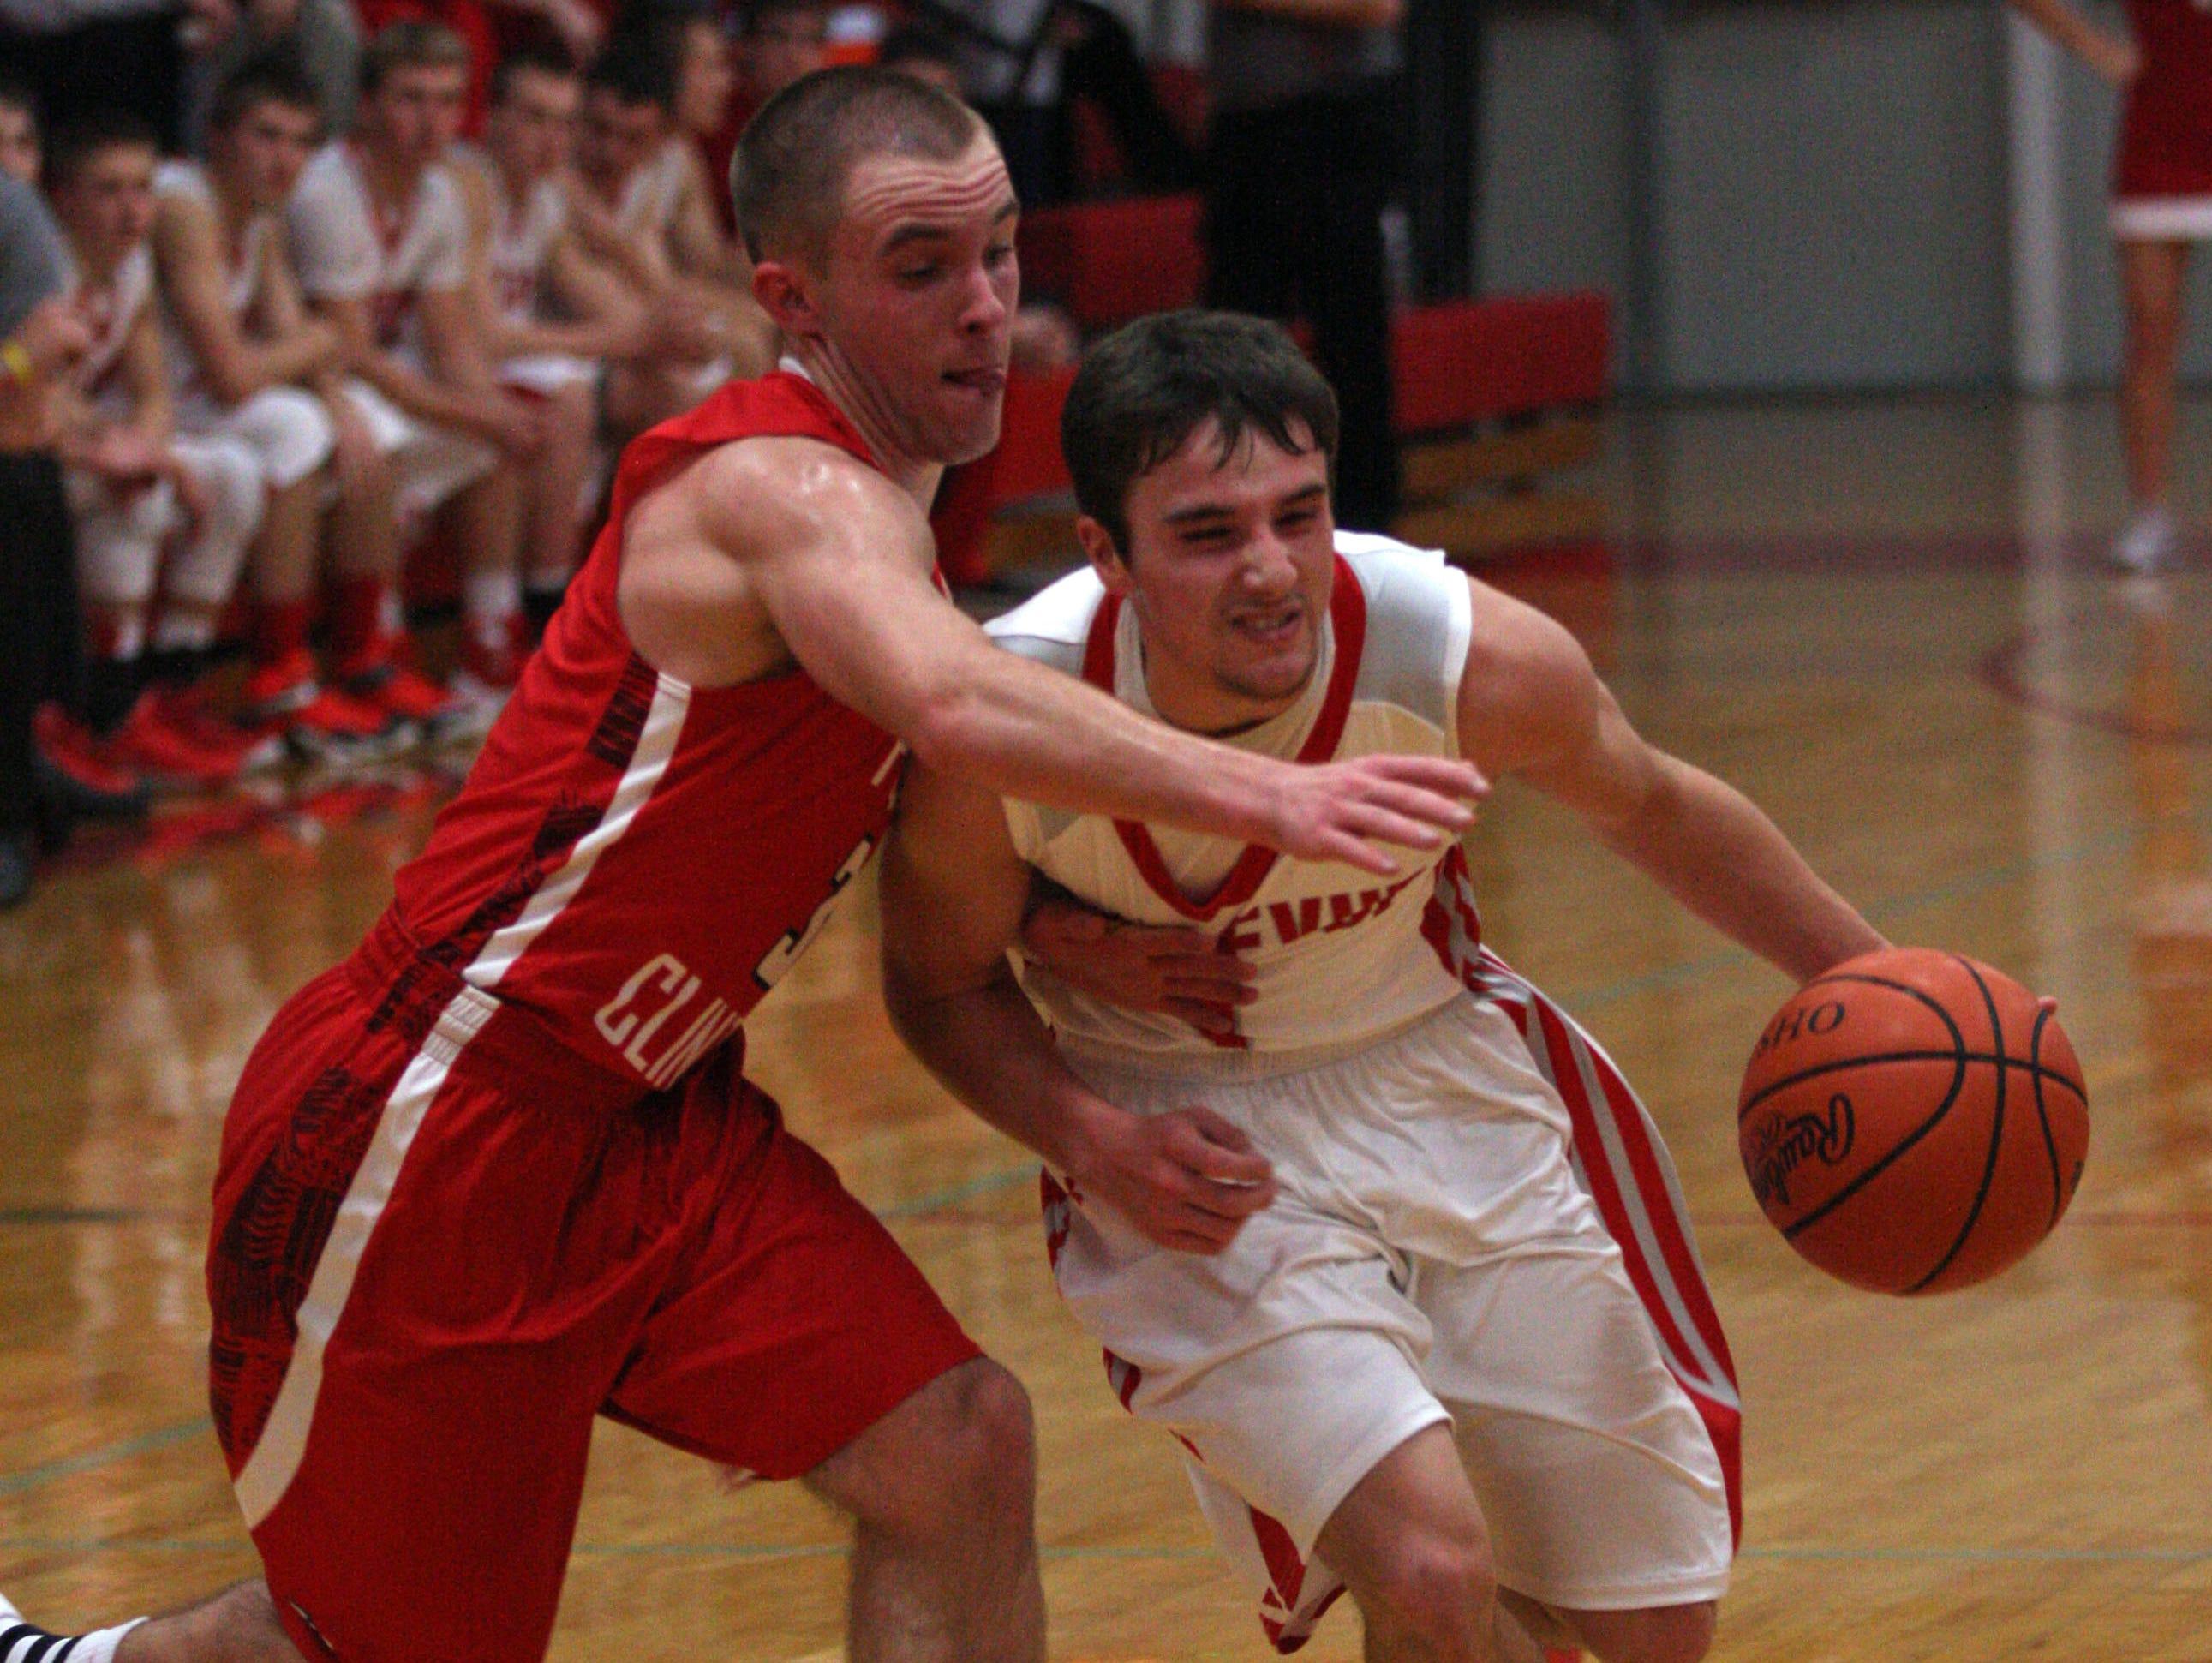 Bellevue's Kyle Geary drives to the basket Thursday as Port Clinton's Kaleb Mizener defends.